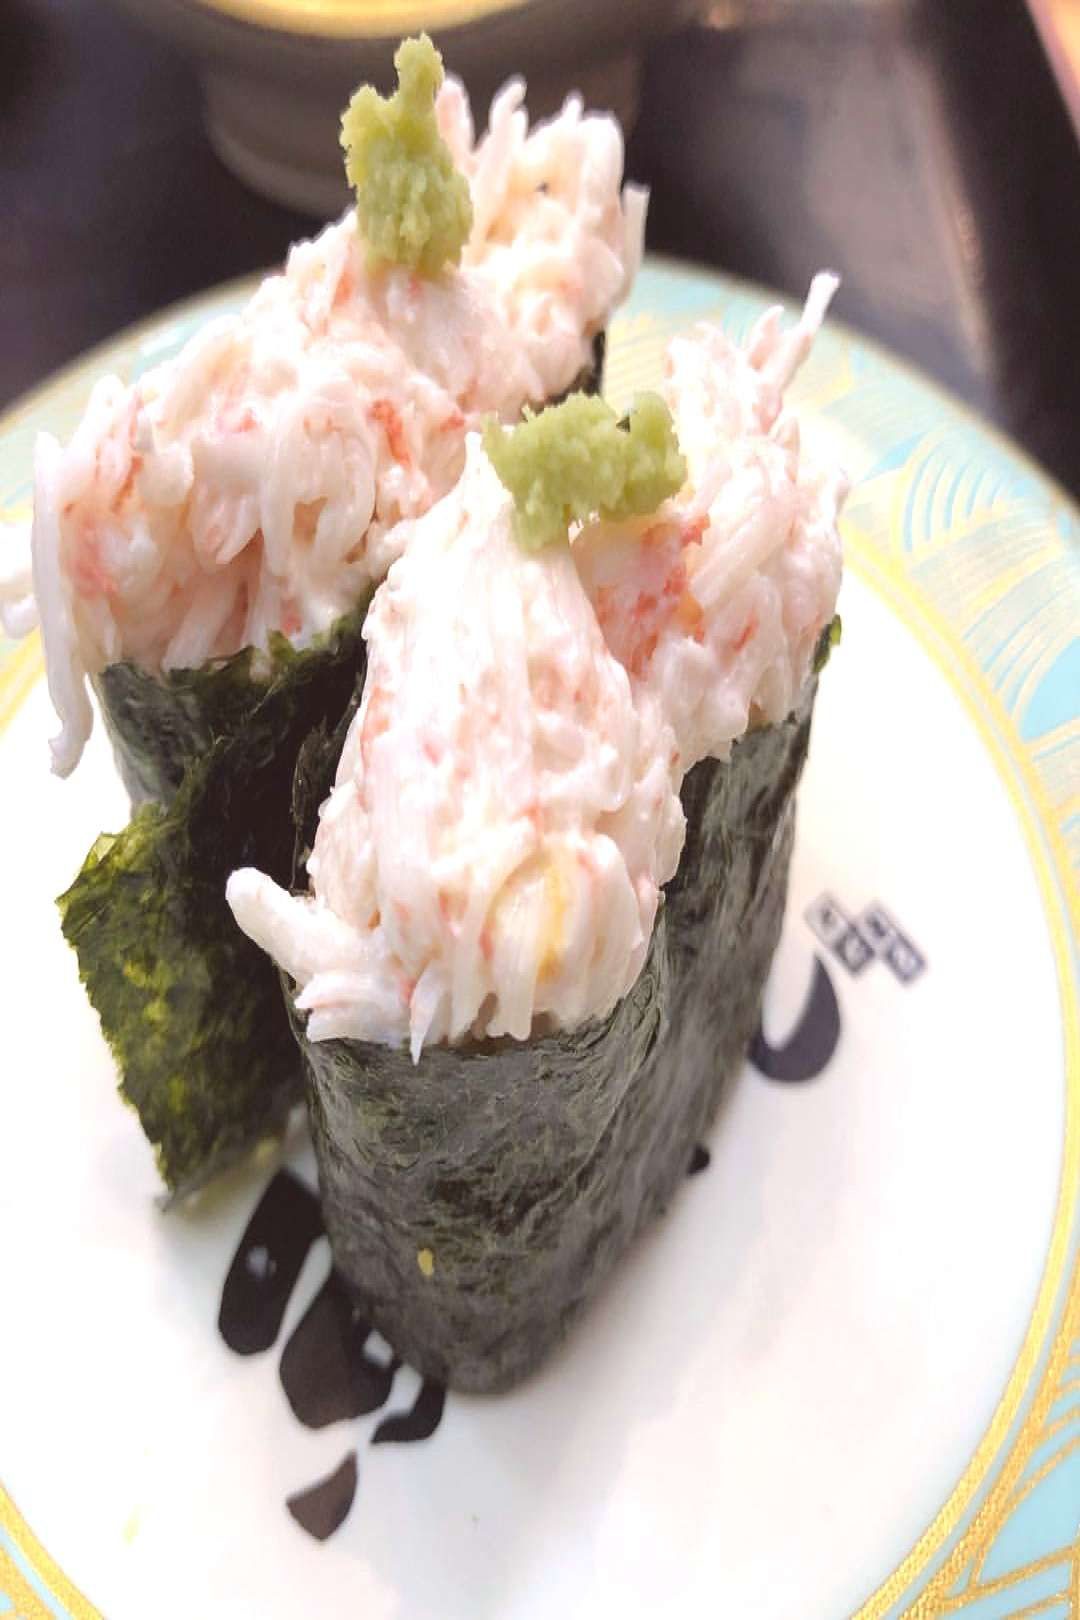 #food 実は結構好きです。 #鮨 #すし #寿司 #回転寿司 #You can find imitation crab salad and more on our website.実は結構好きです。 #鮨 #すし #寿司 #回転寿司 #